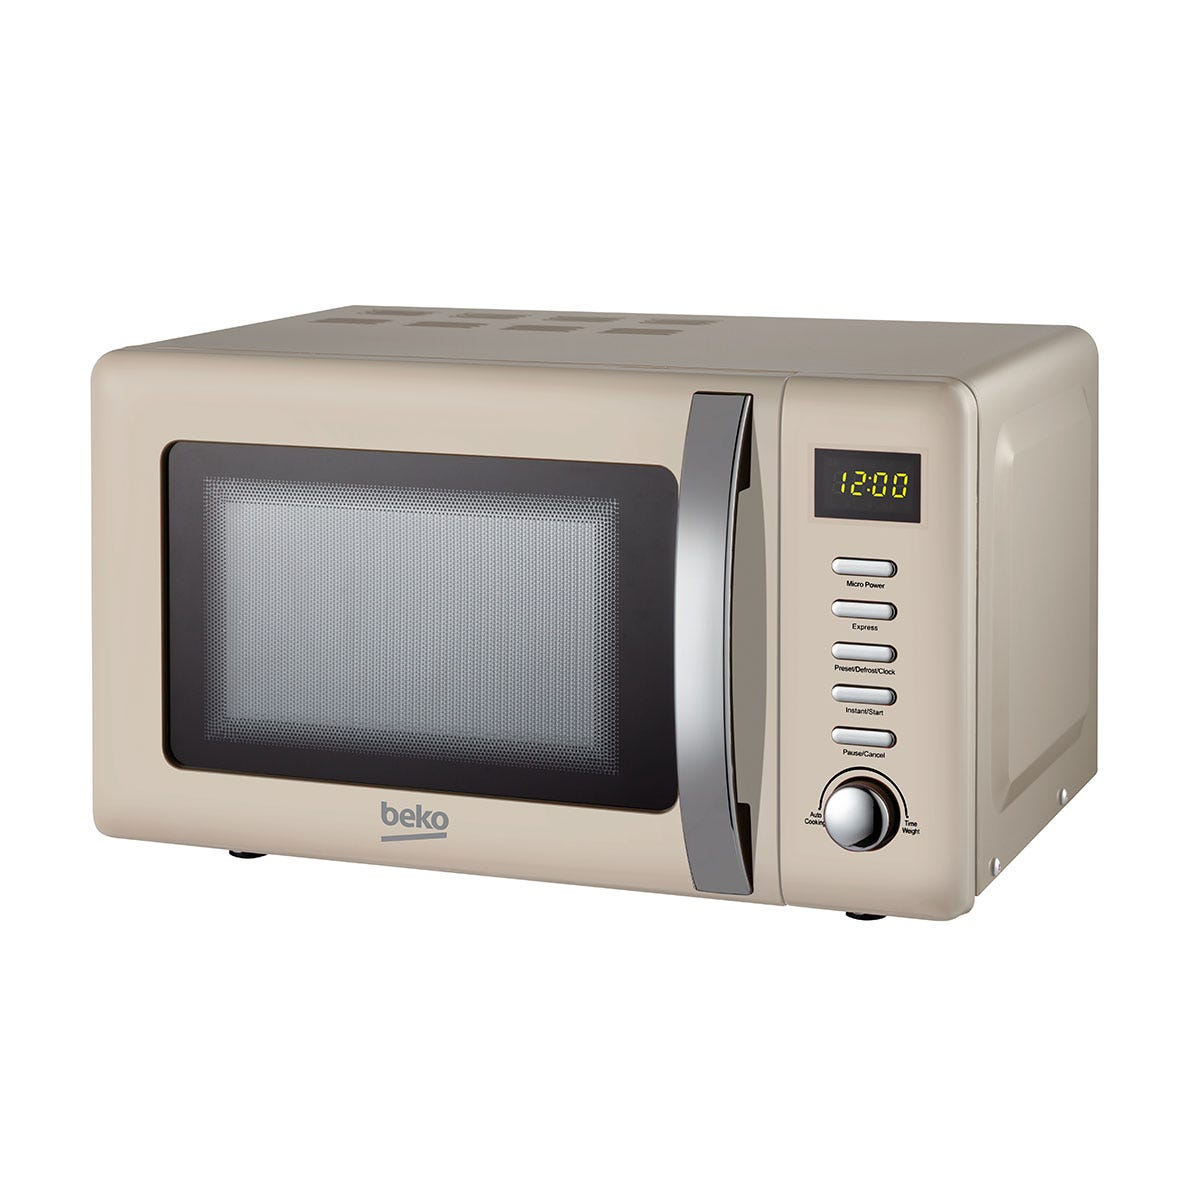 Beko MOC20200C 800W Retro 20L Compact Microwave - Cream